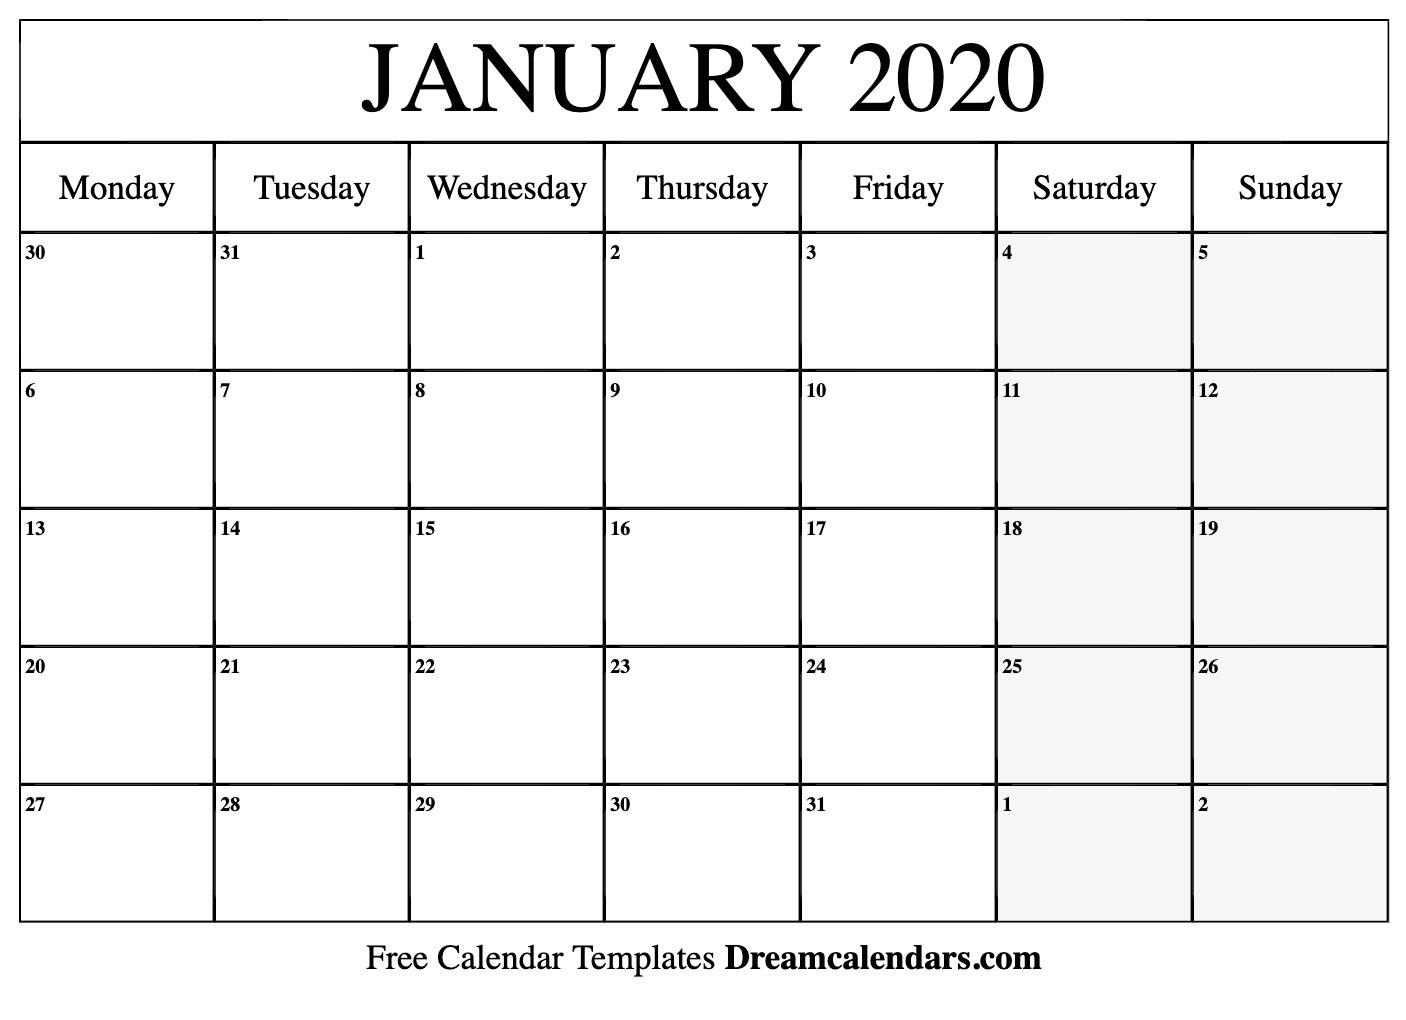 Printable January 2020 Calendar-Free Printable January 2020 Calendar With Holidays